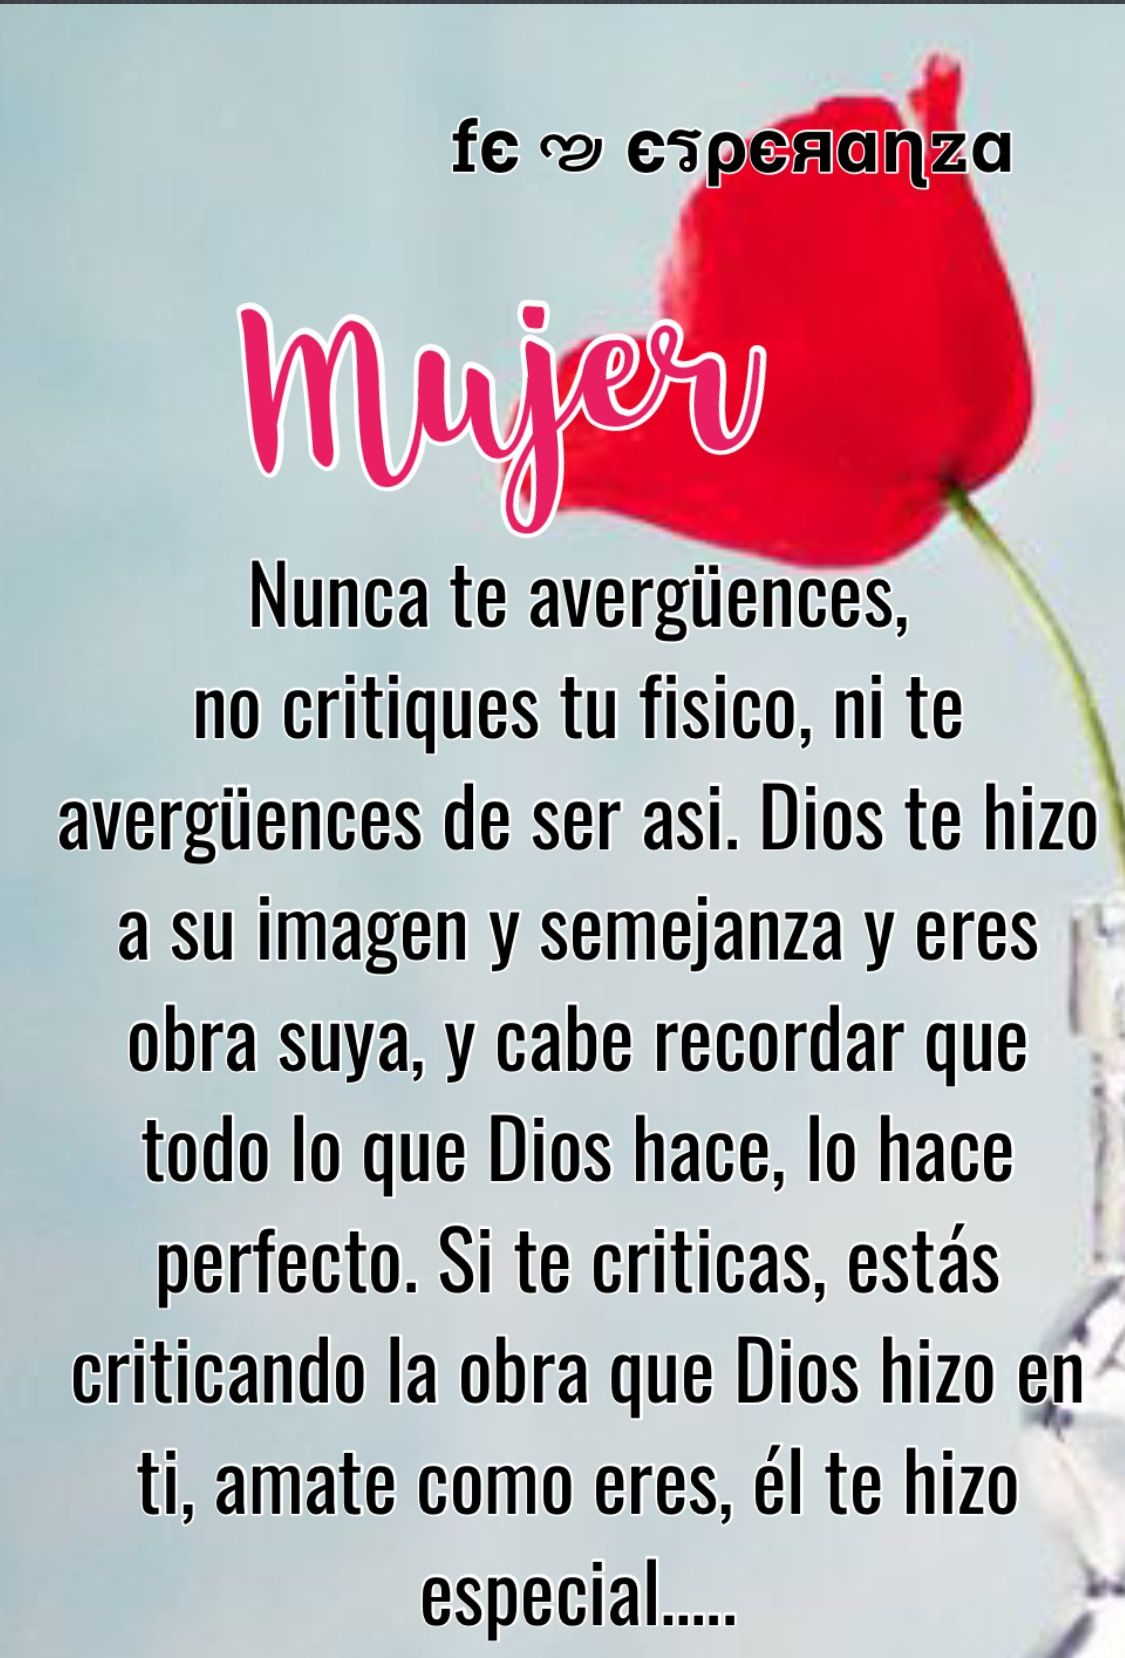 Con Dios Dios Es Amor Amor Hermoso Hermosa Frases Frases Cristianas Fuerza Cristianos Madres Palabras